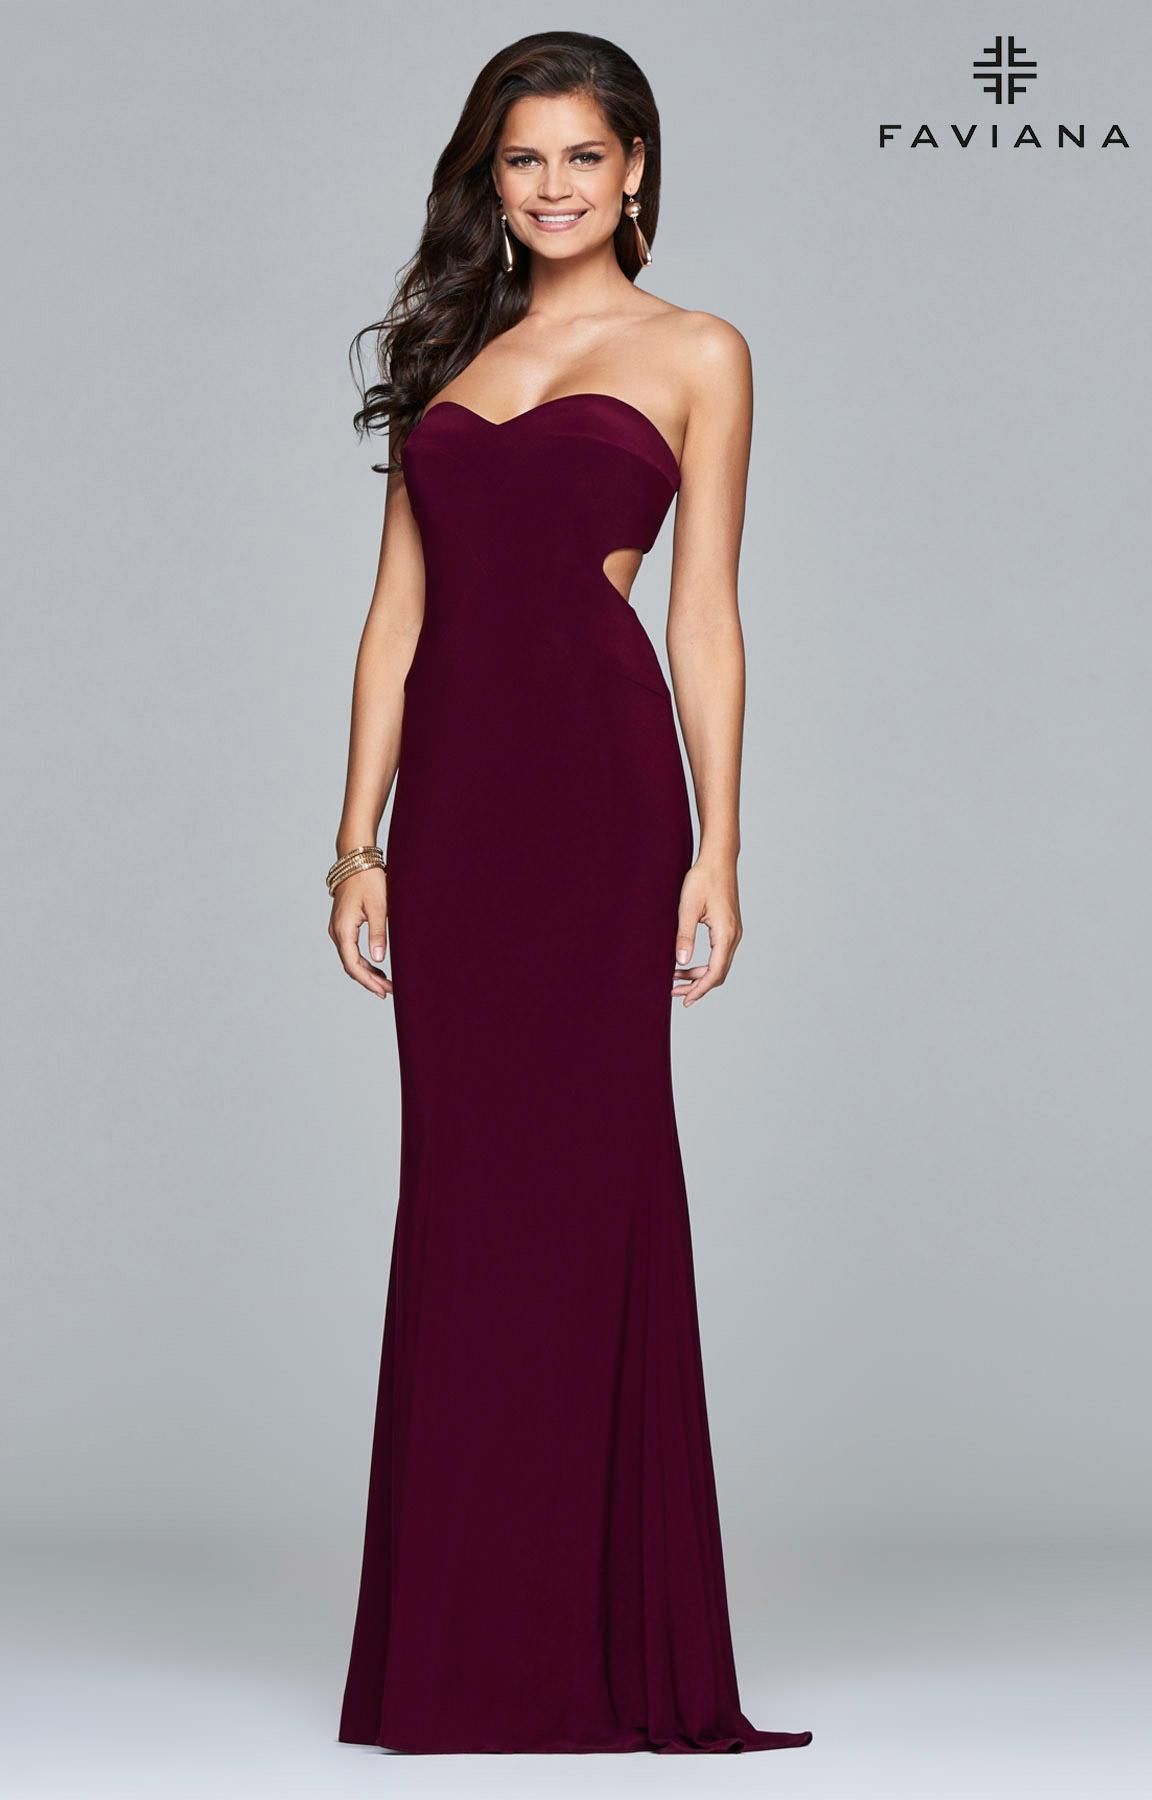 Faviana S7922 Sleek Strapless Sweetheart Dress Prom Dress